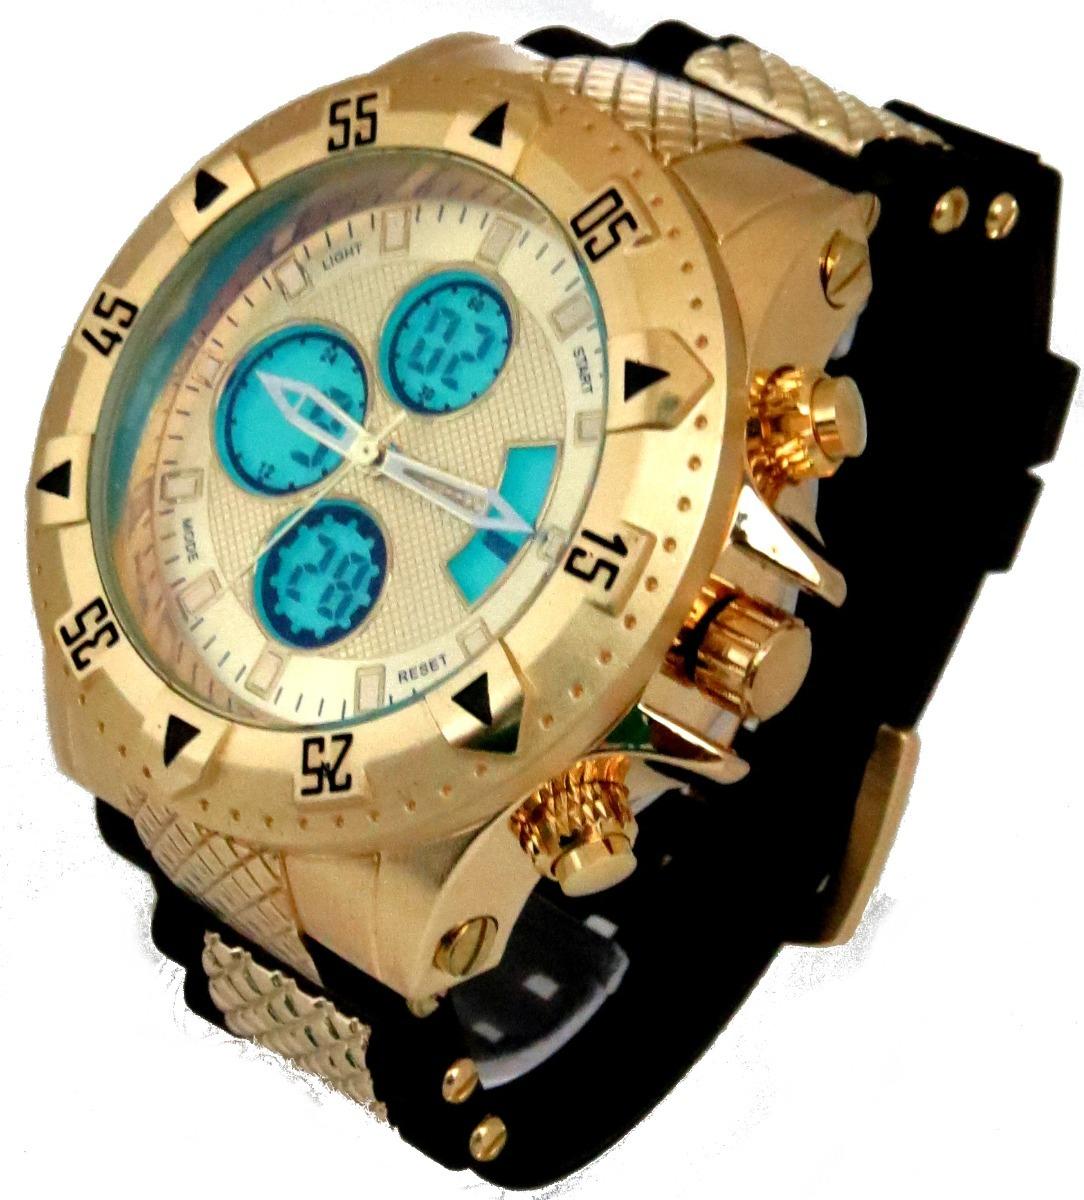 bf260f62c53 relógios masculino dourado grande todo funcional na caixa. Carregando zoom.